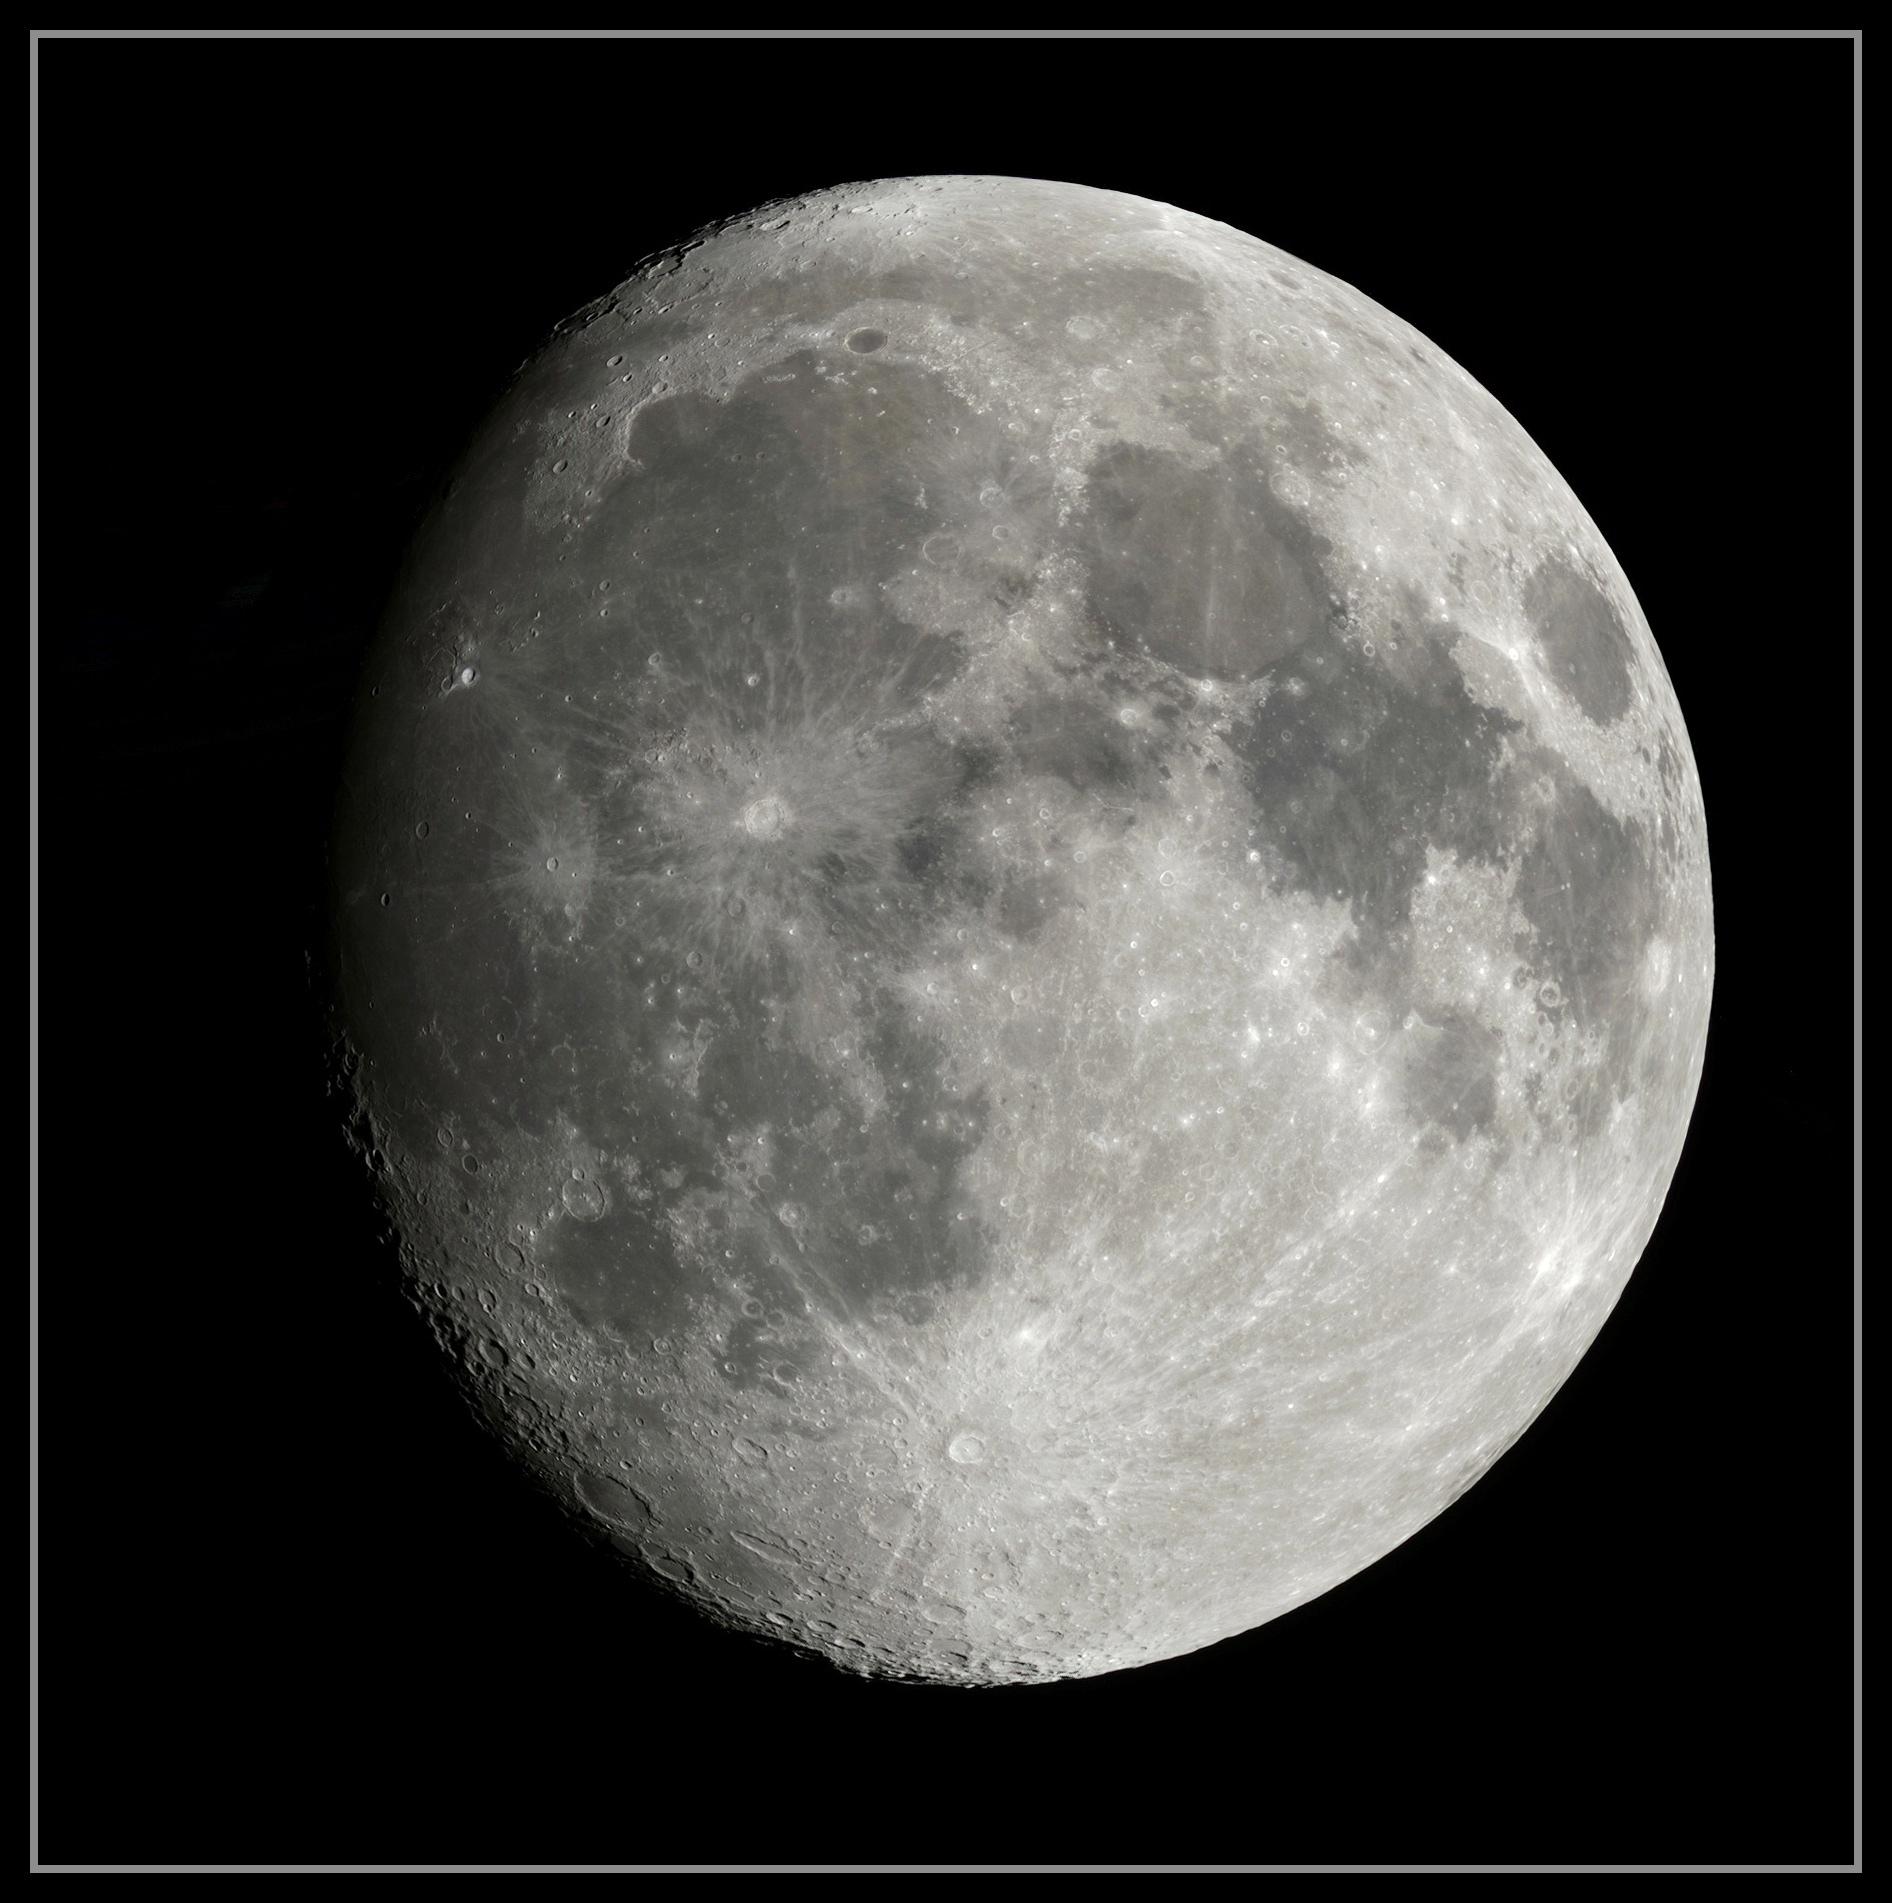 5e3ef457152c6_Moon_212734_060220_ZWOASI224MC_RGB_AS_P15_lapl3_ap942_stitchbase.jpg.97aa77d85767e7d8ea097630482b4706.jpg